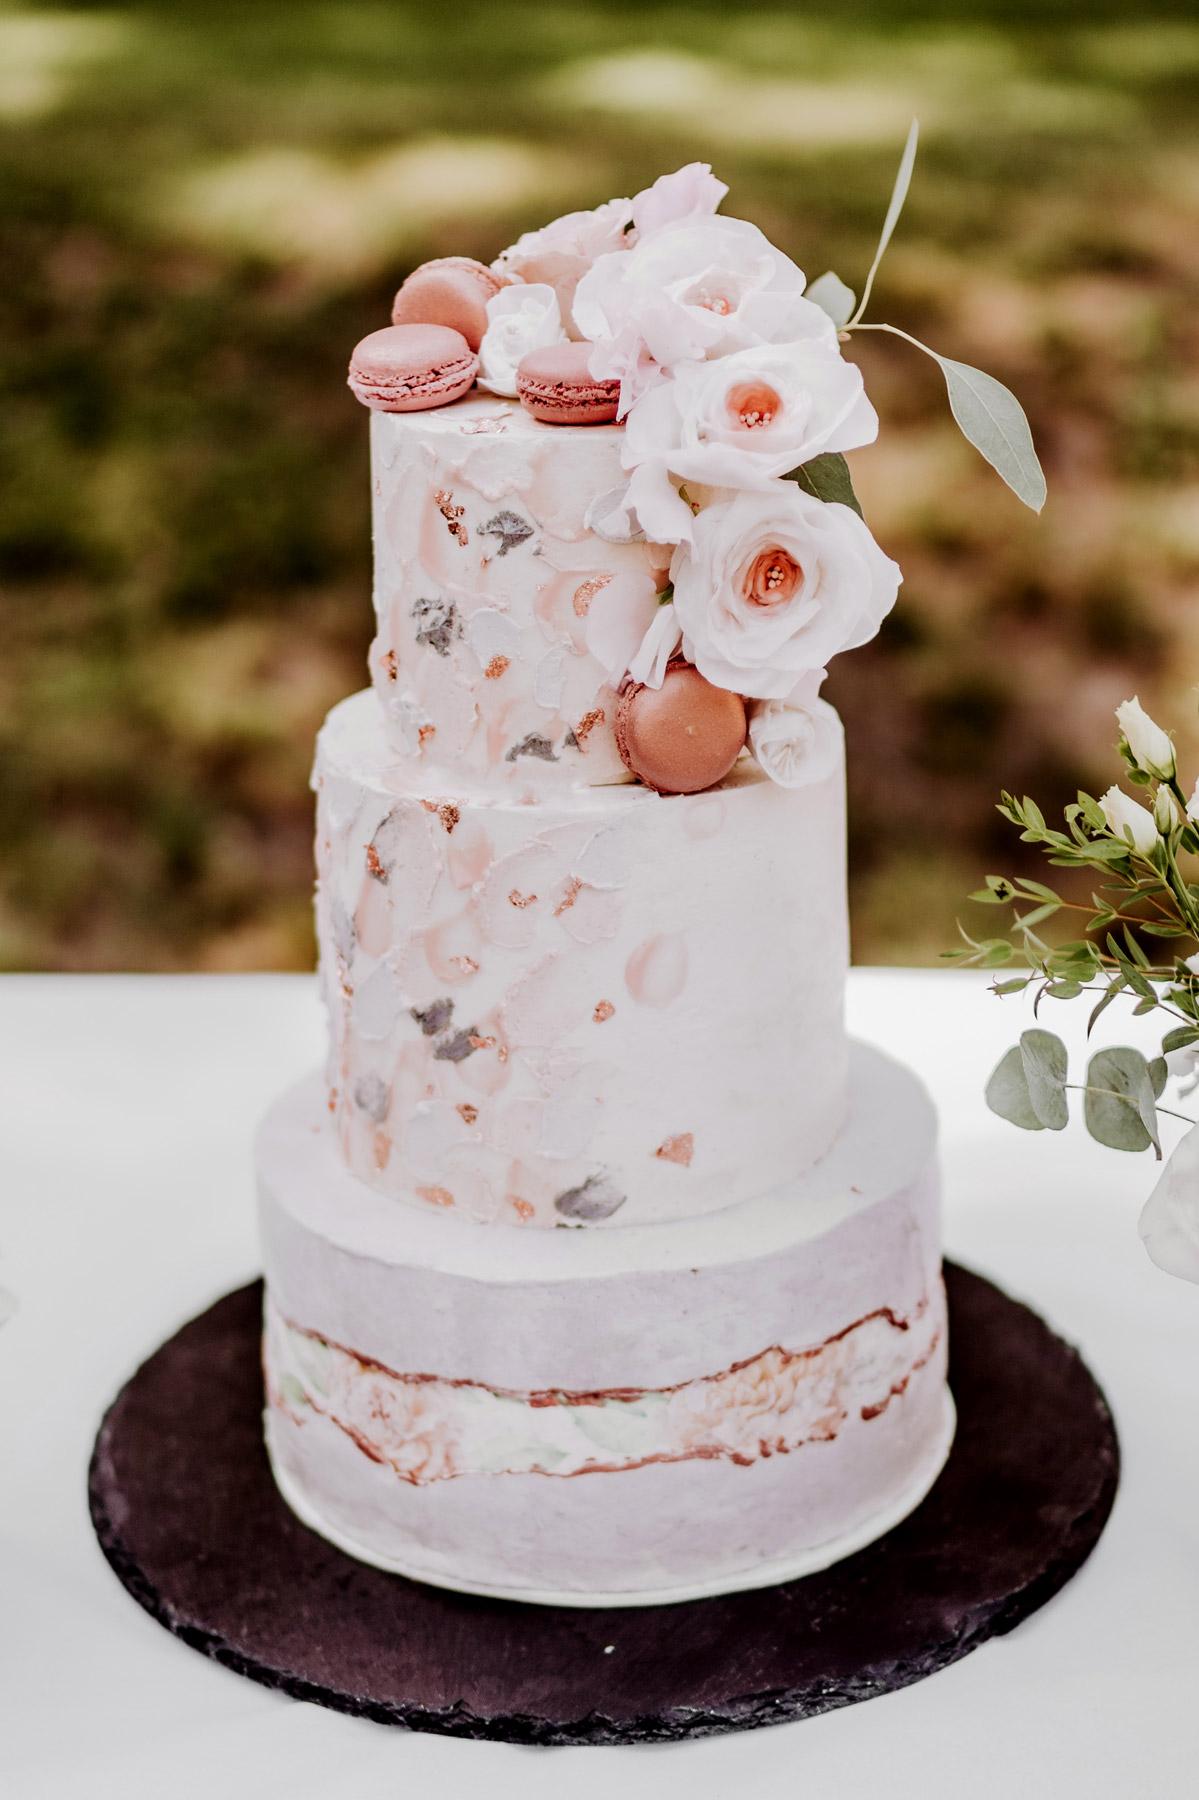 Hochzeitstorte Fondant handbemalt mit Kupfer Macaron und rosa Rosen brushstroke painted buttercream wedding cake #paintedcake #weddingcake #buttercream #wedding von Hochzeitsfotograf Berlin © www.hochzeitslicht.de #hochzeitslicht